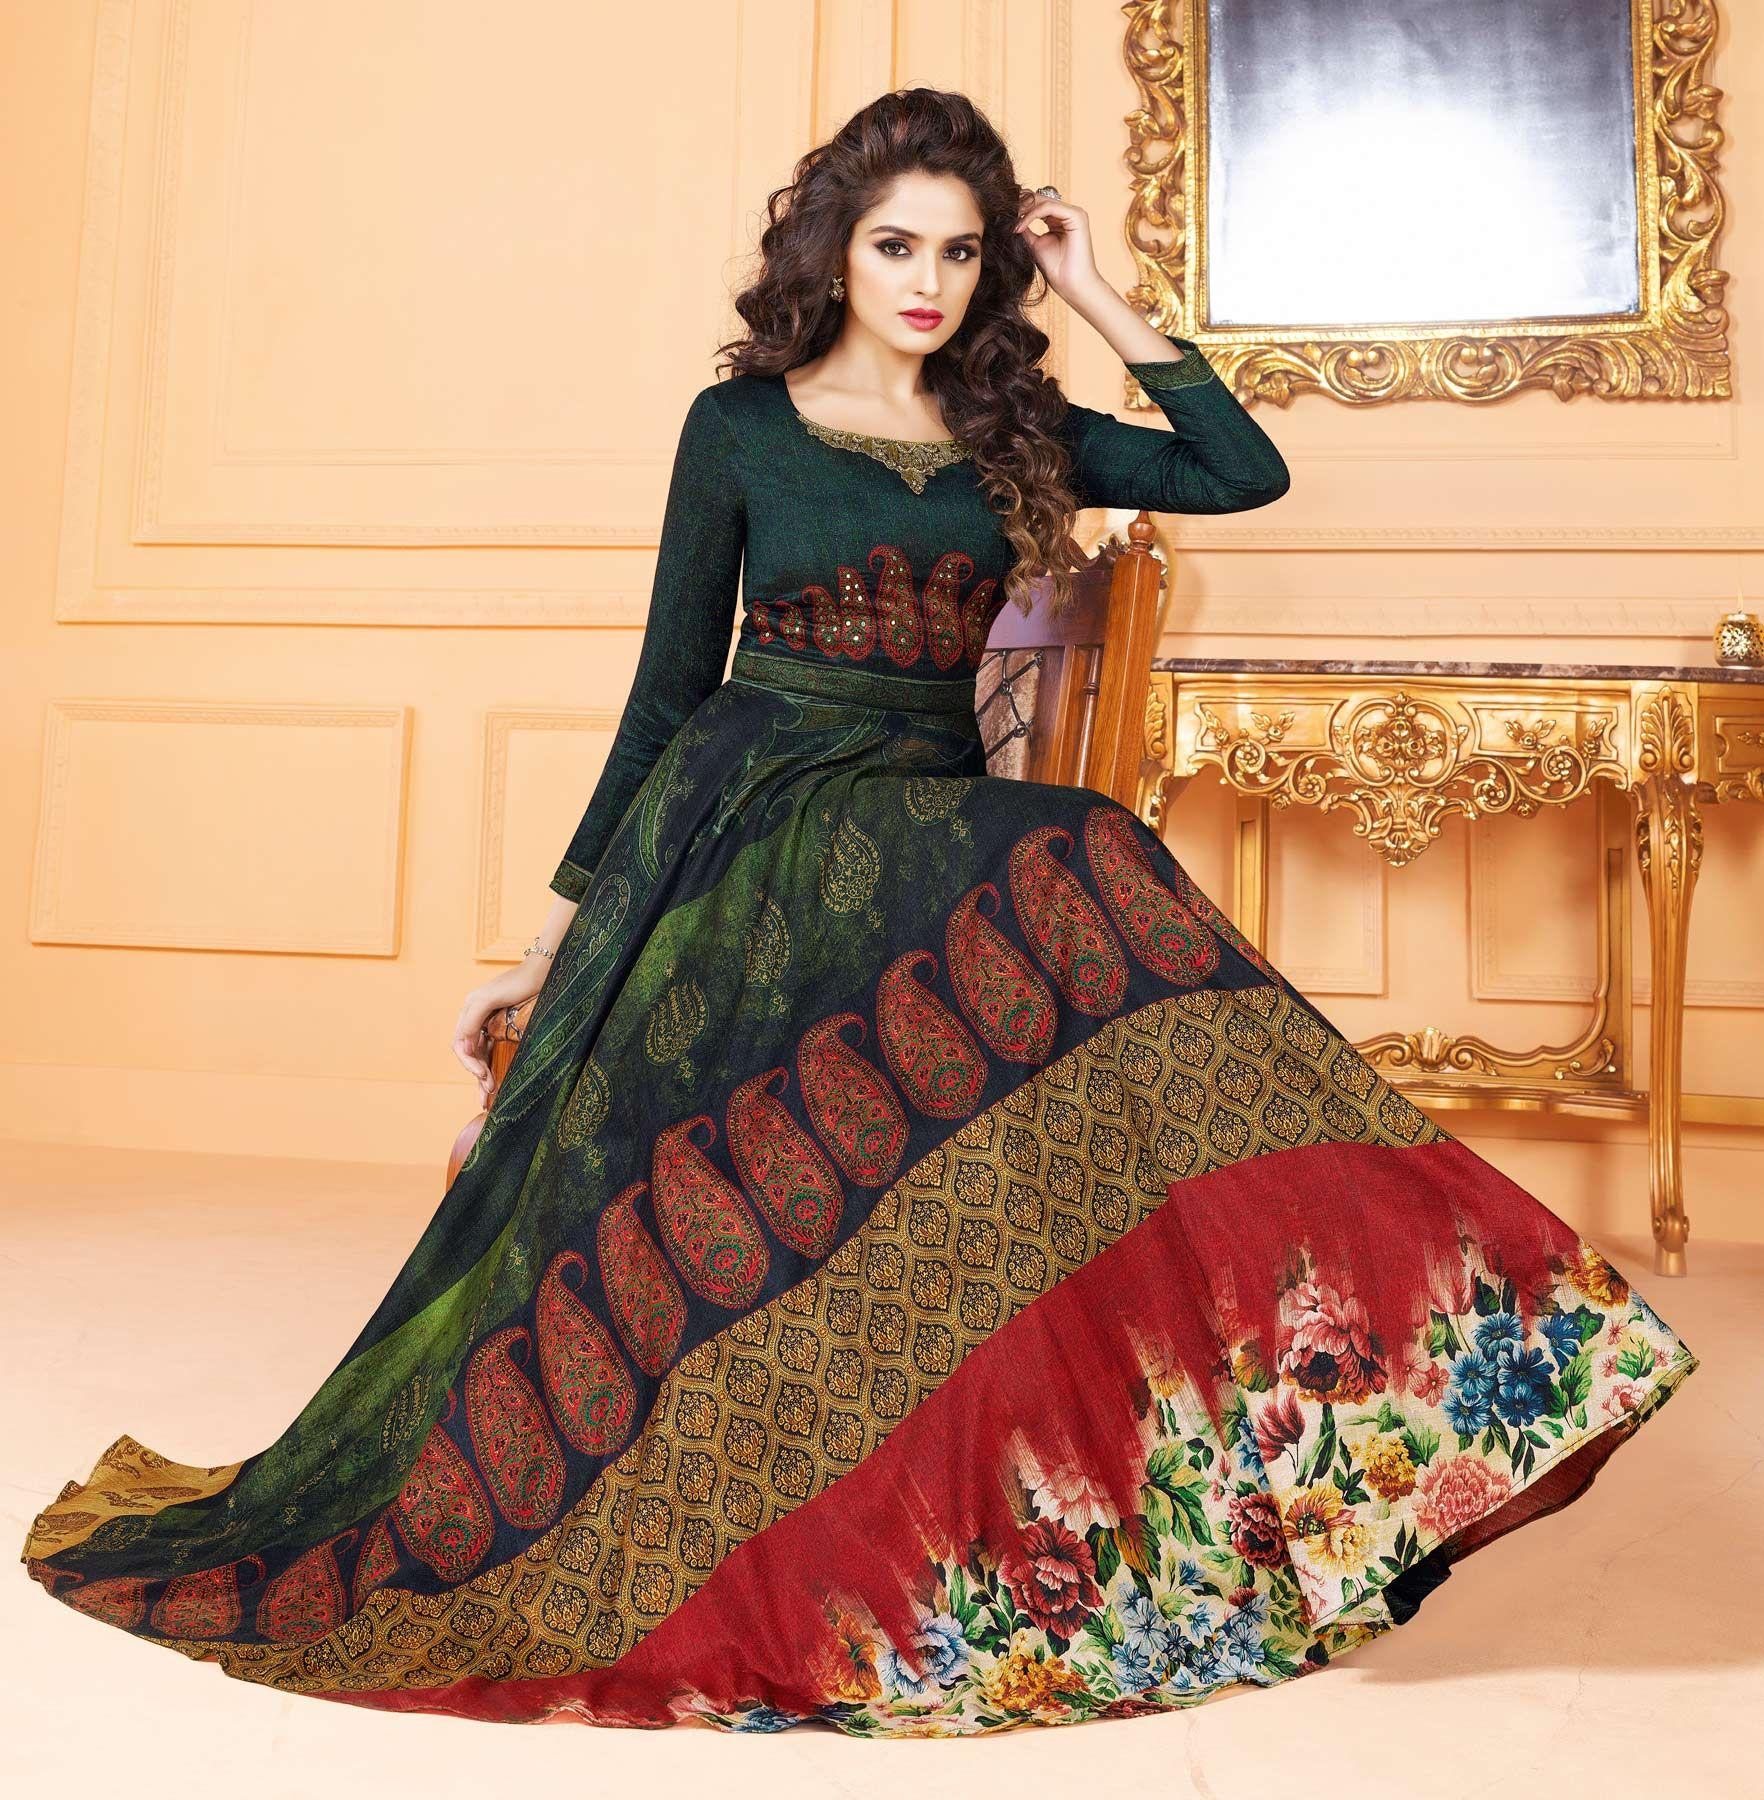 10b6cbbf42 Stunning Dark Green Colored Partywear Digital Printed Tussar Art Silk Gown